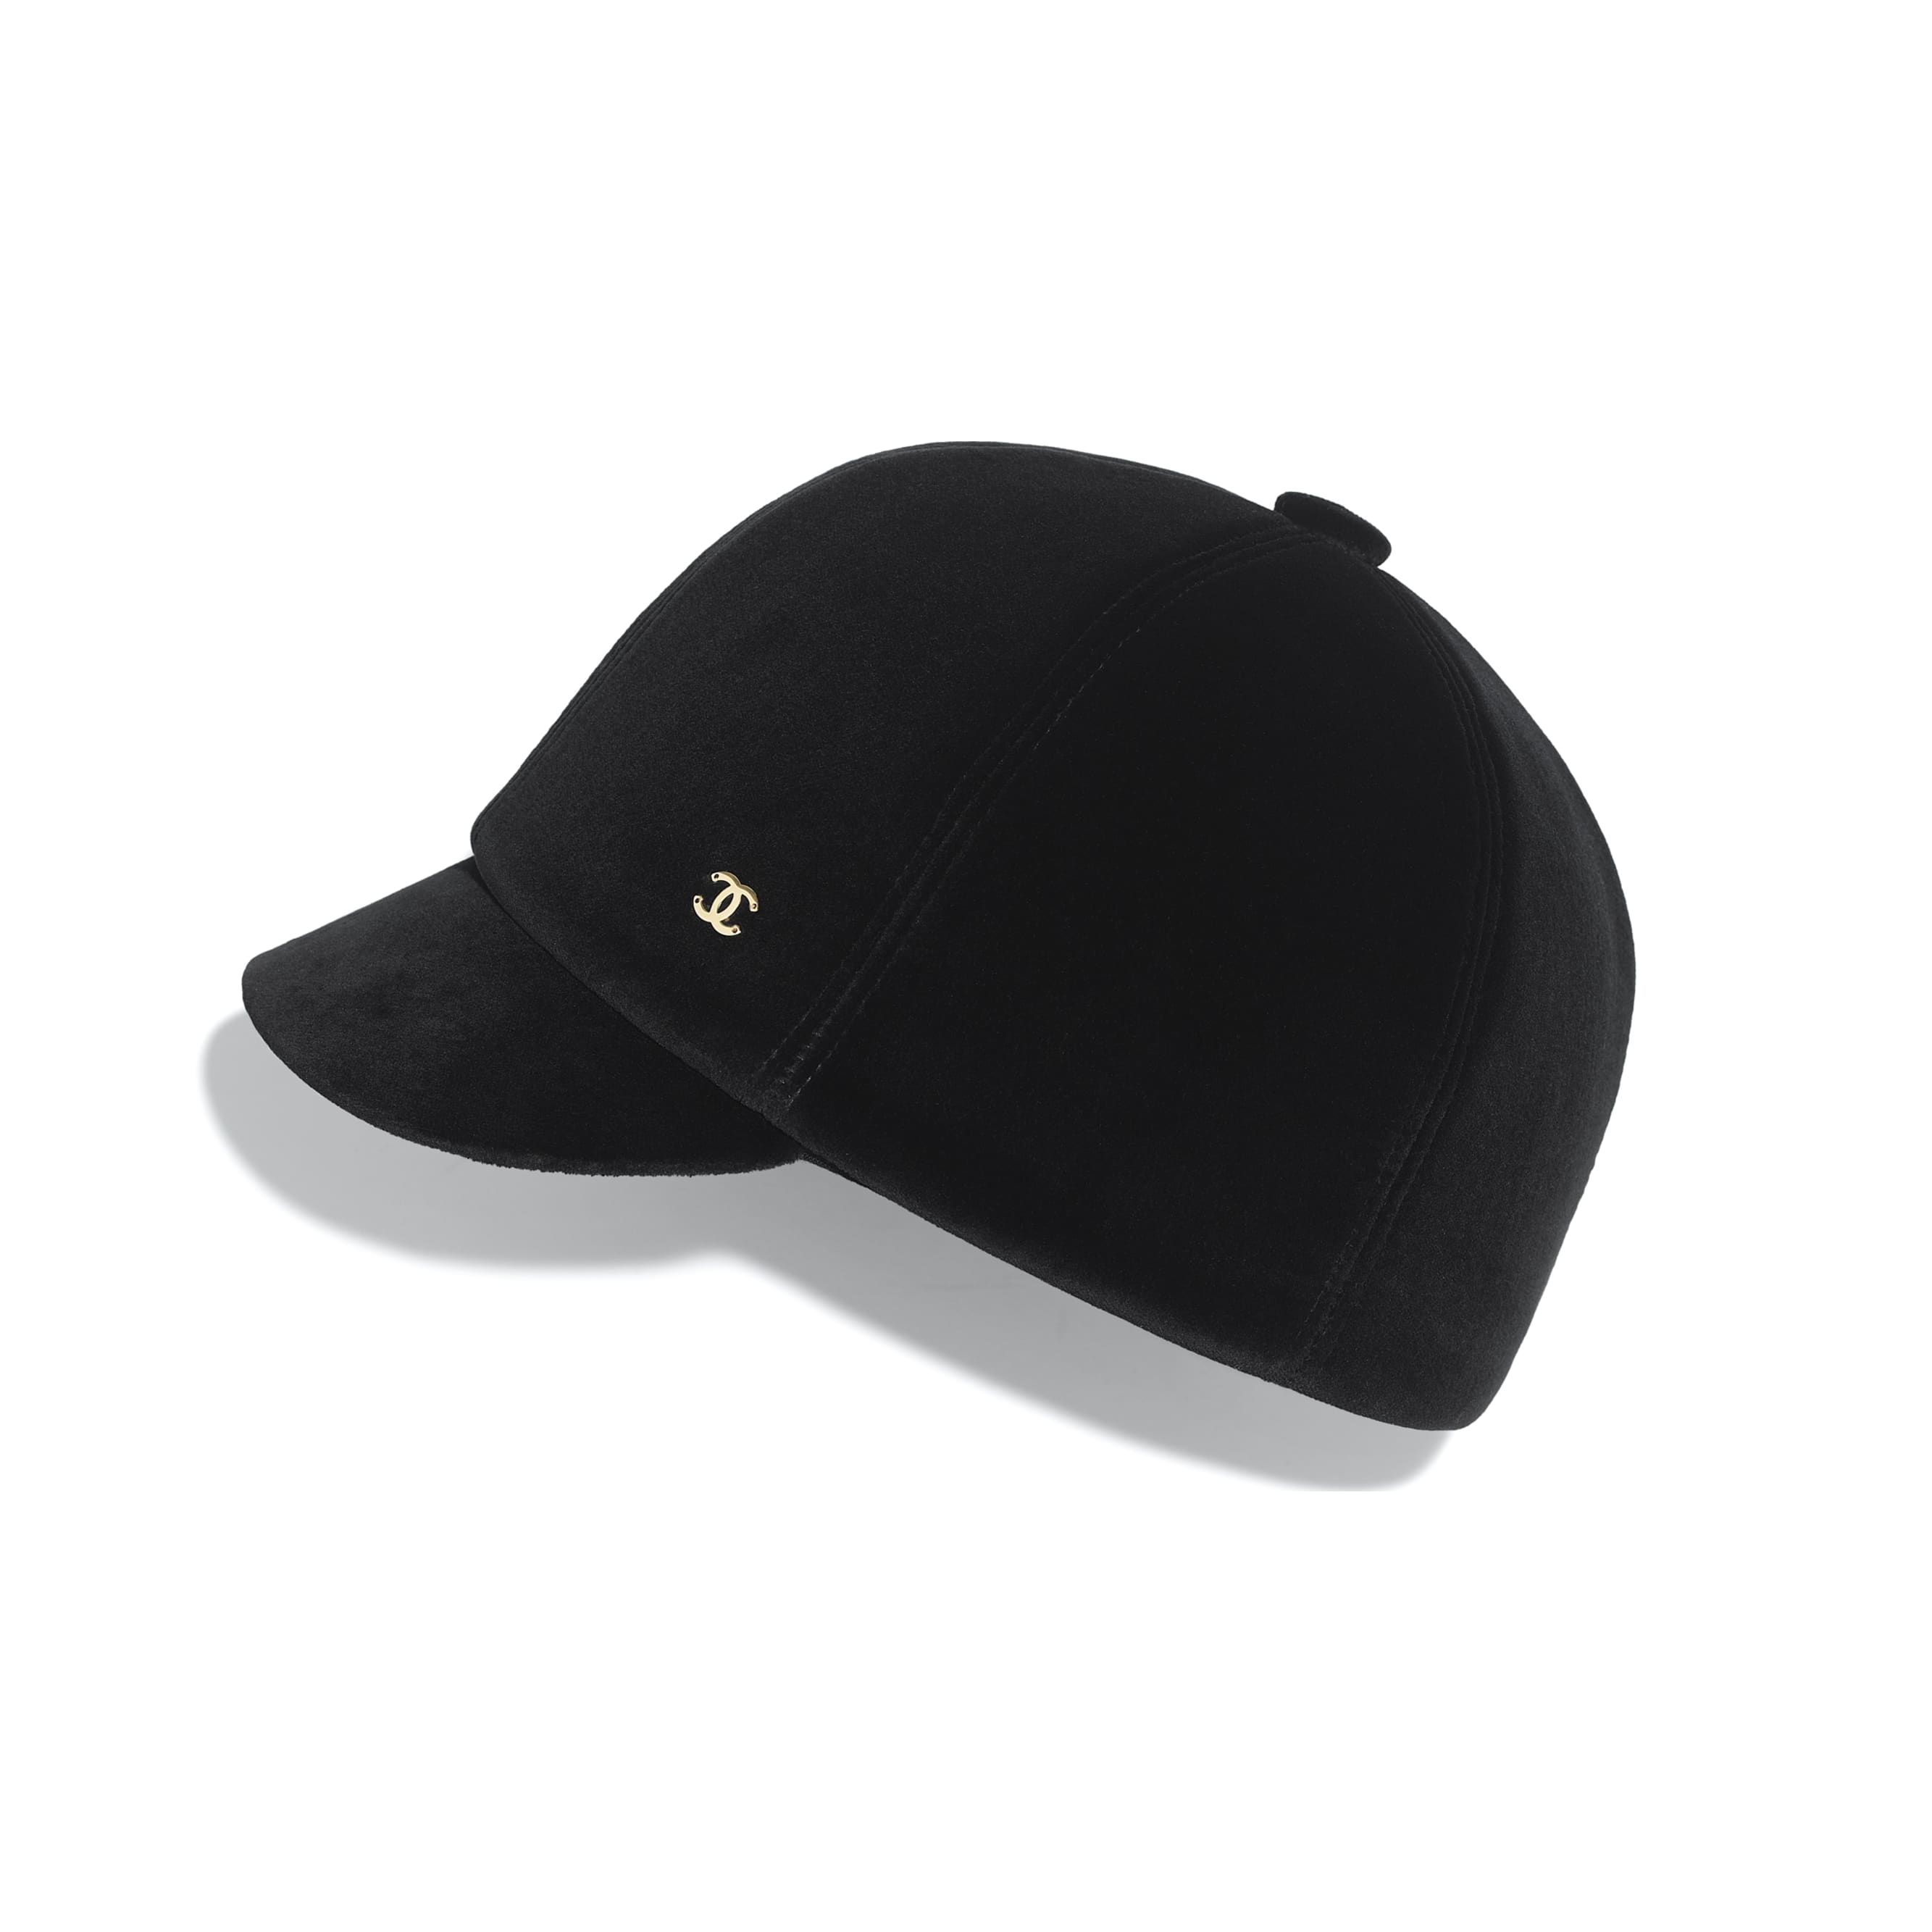 Hat - Black - Velvet - CHANEL - Default view - see standard sized version